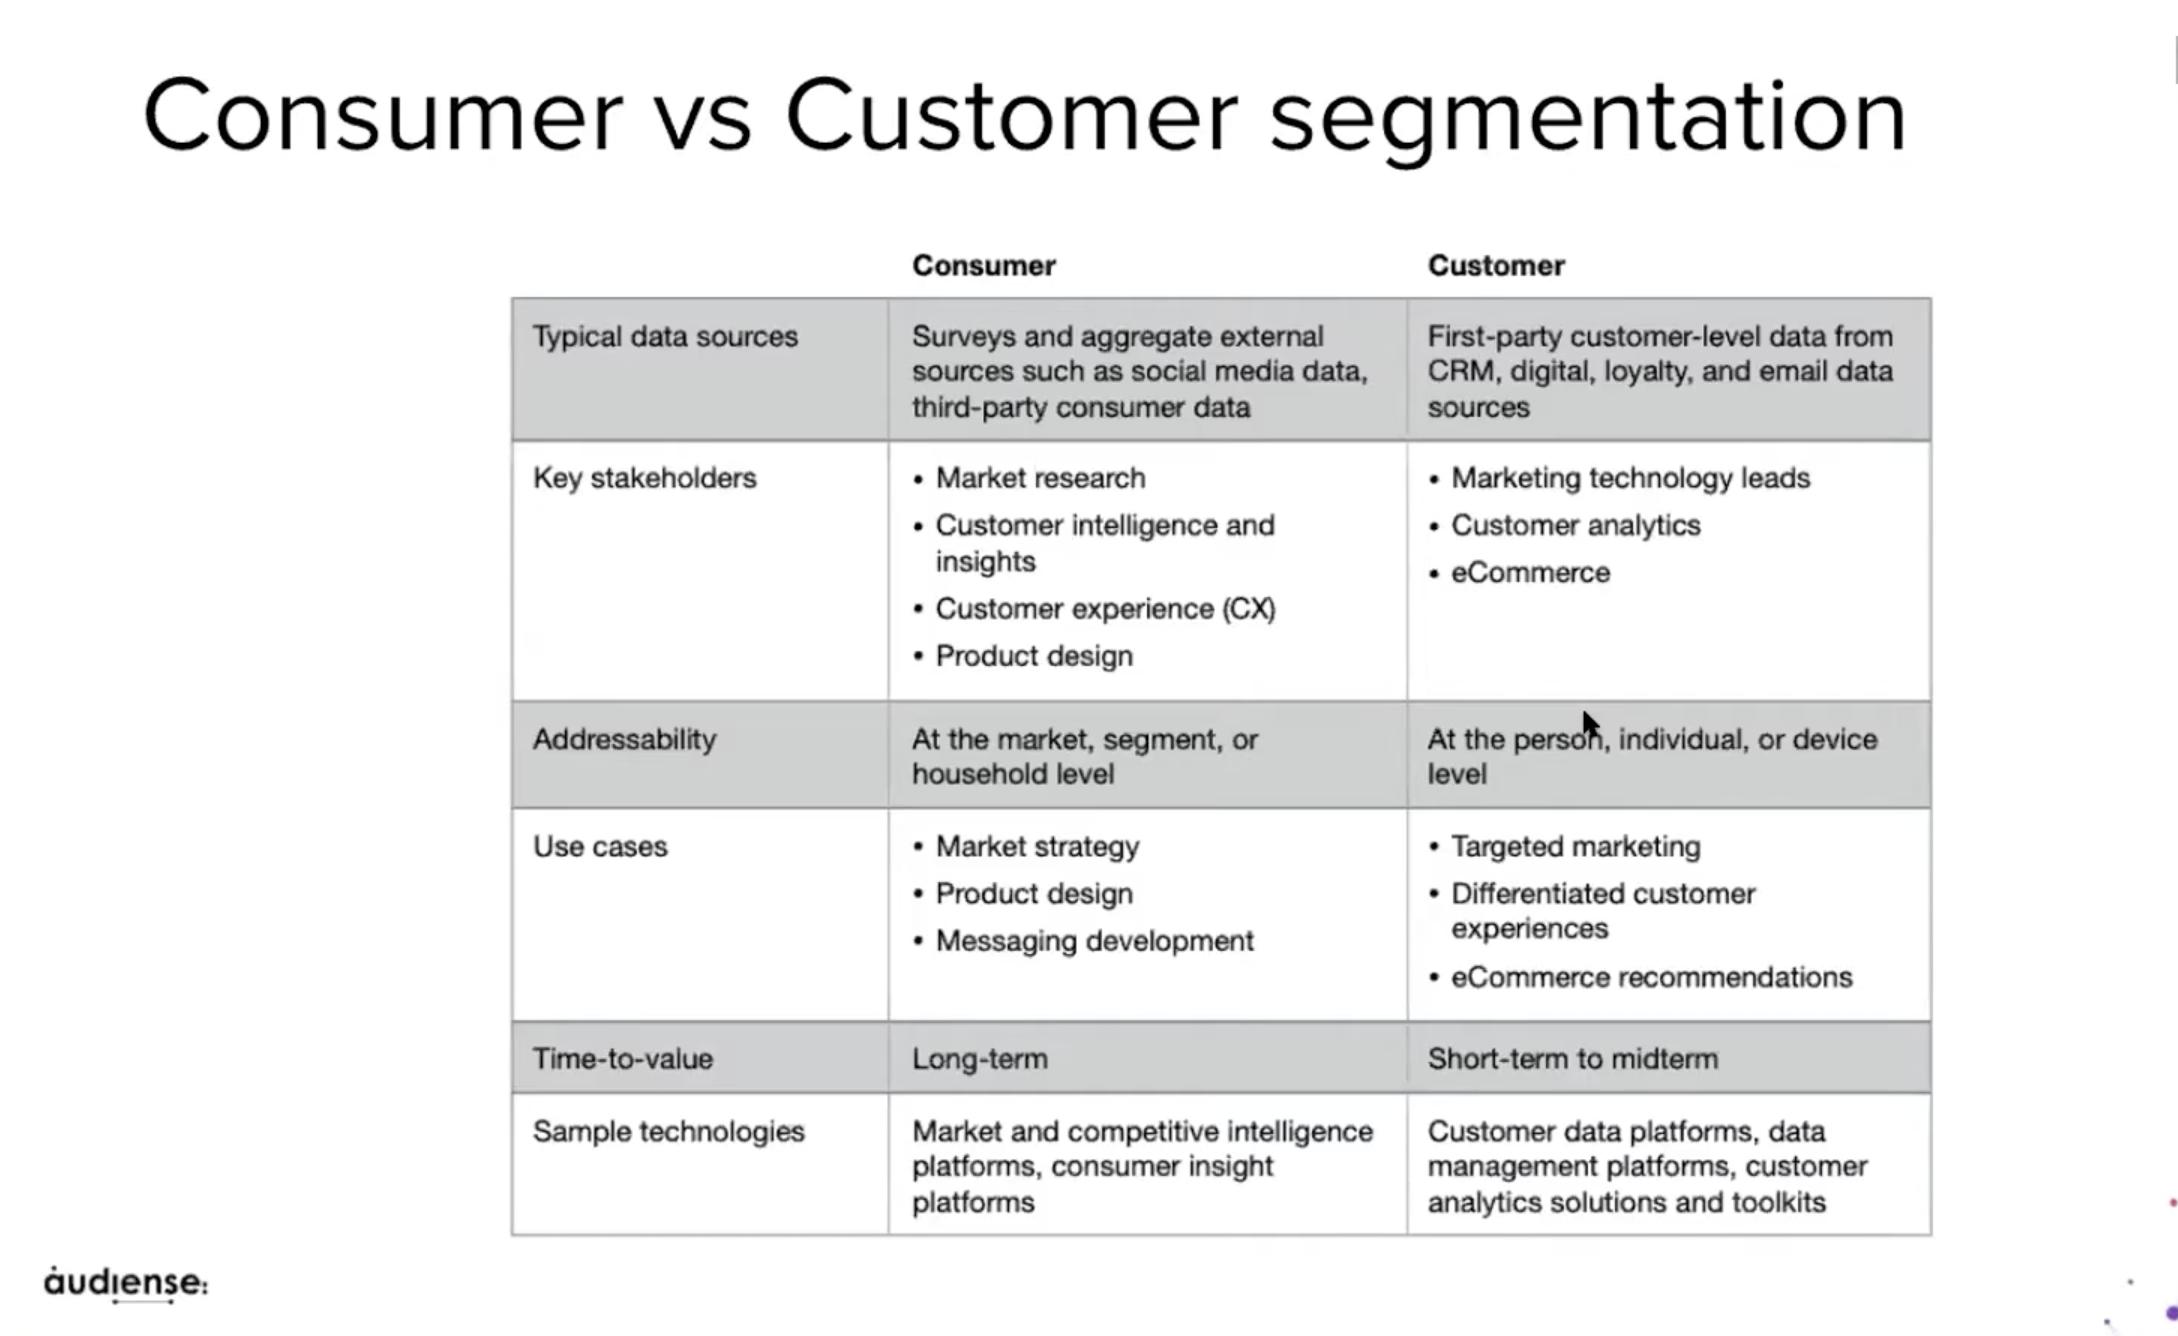 Audiense blog - Segmenting customers vs consumers | Audiense